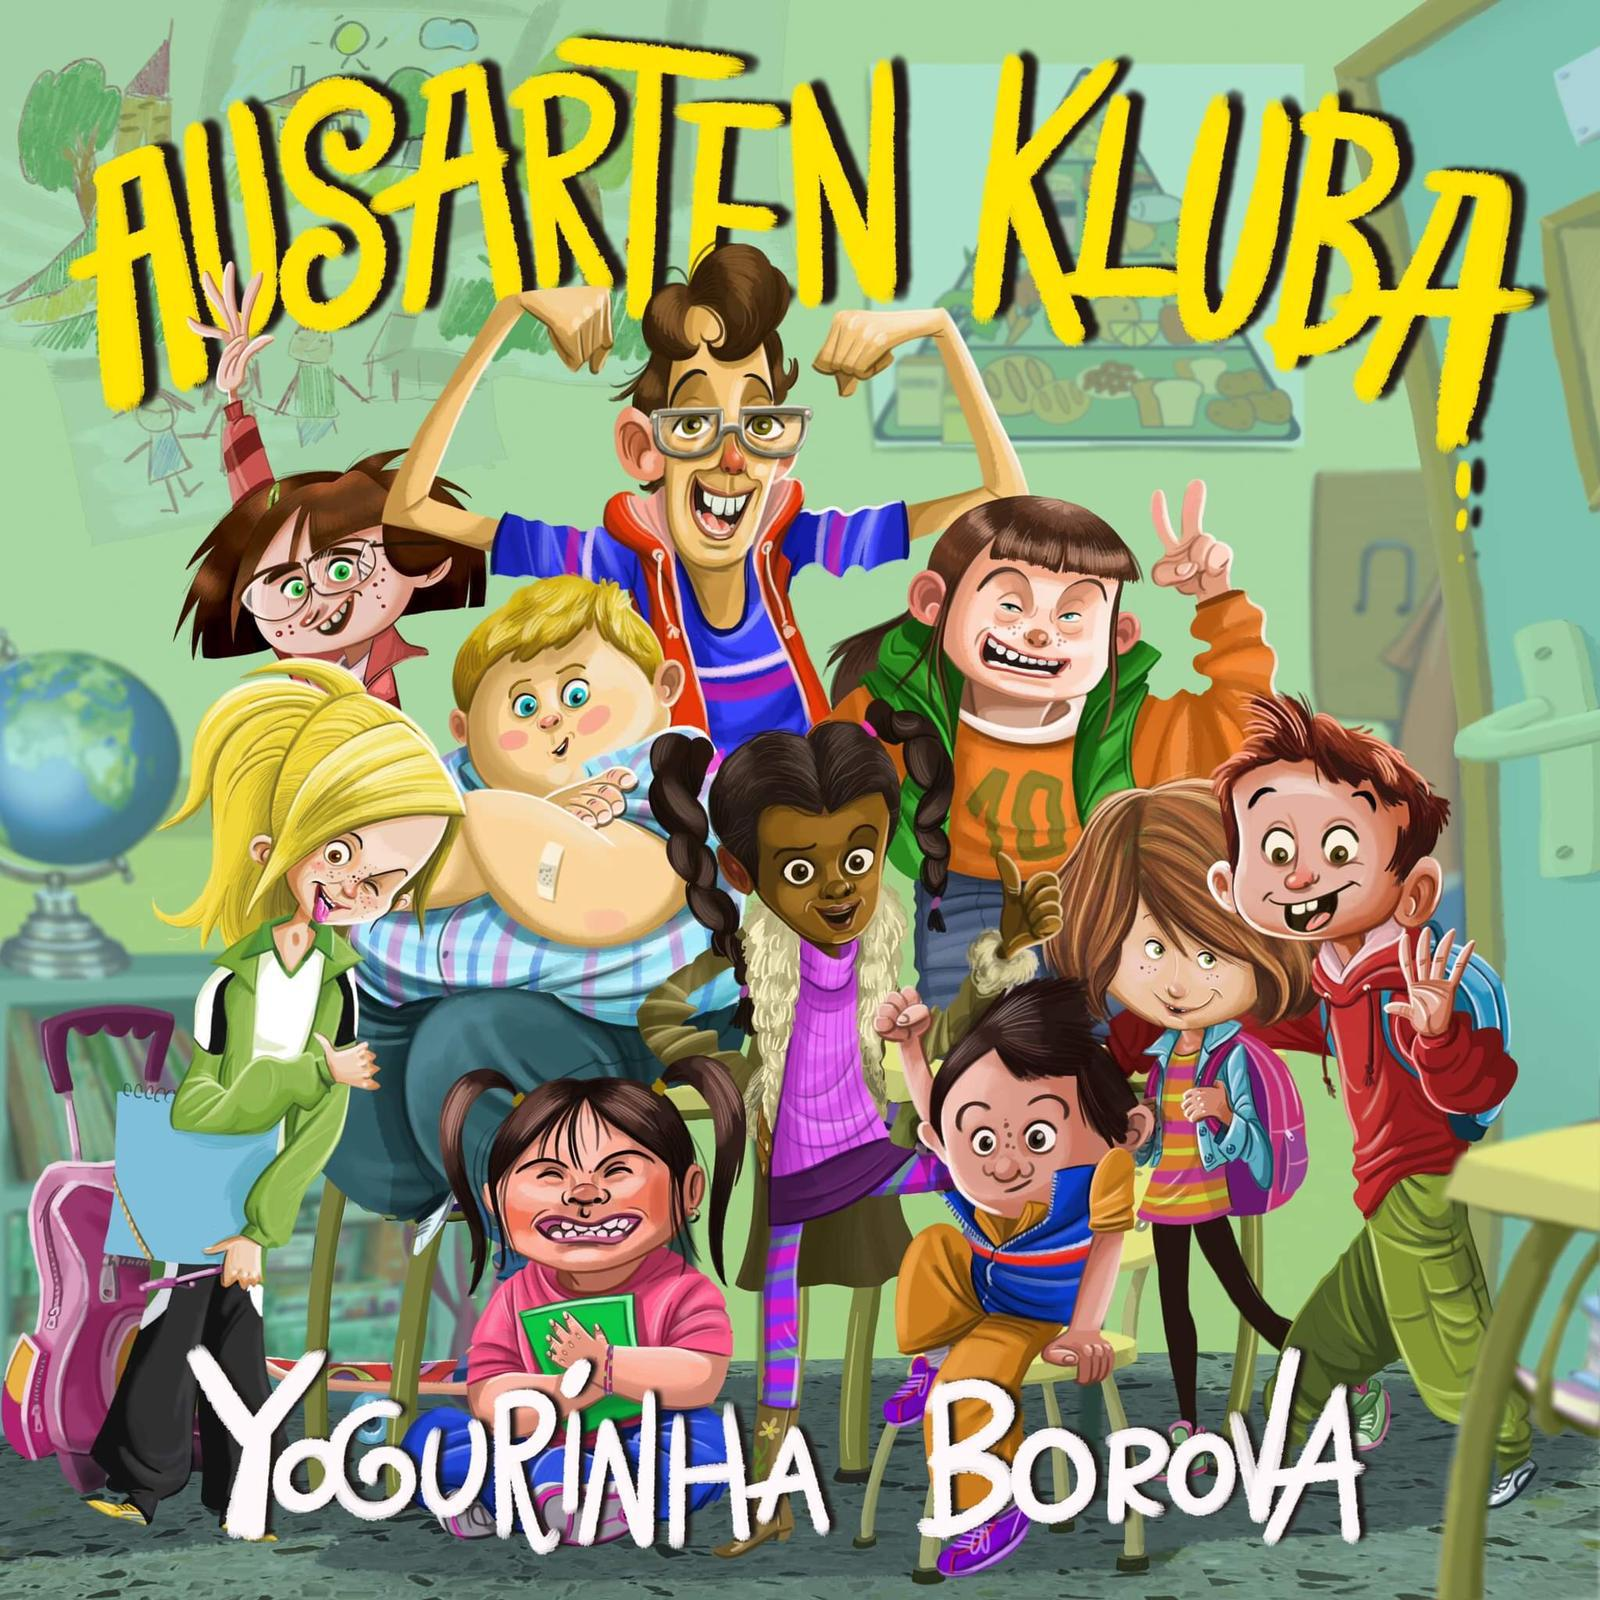 Yogurinha Borova bullying